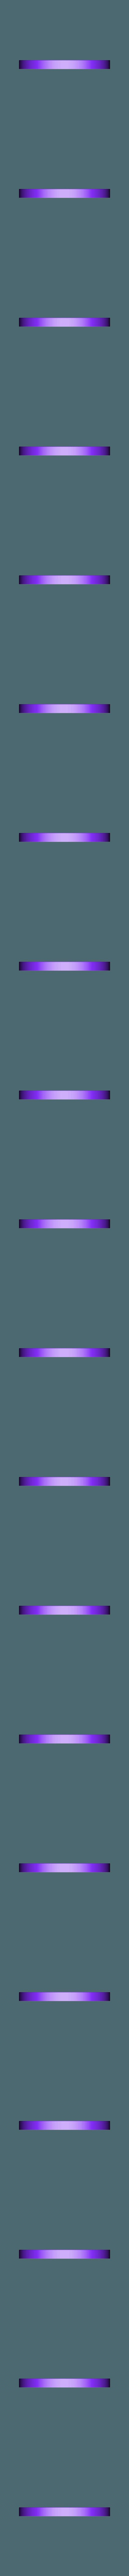 ts_brille.stl Download free STL file Minion door spyhole cover • 3D print design, uepsie